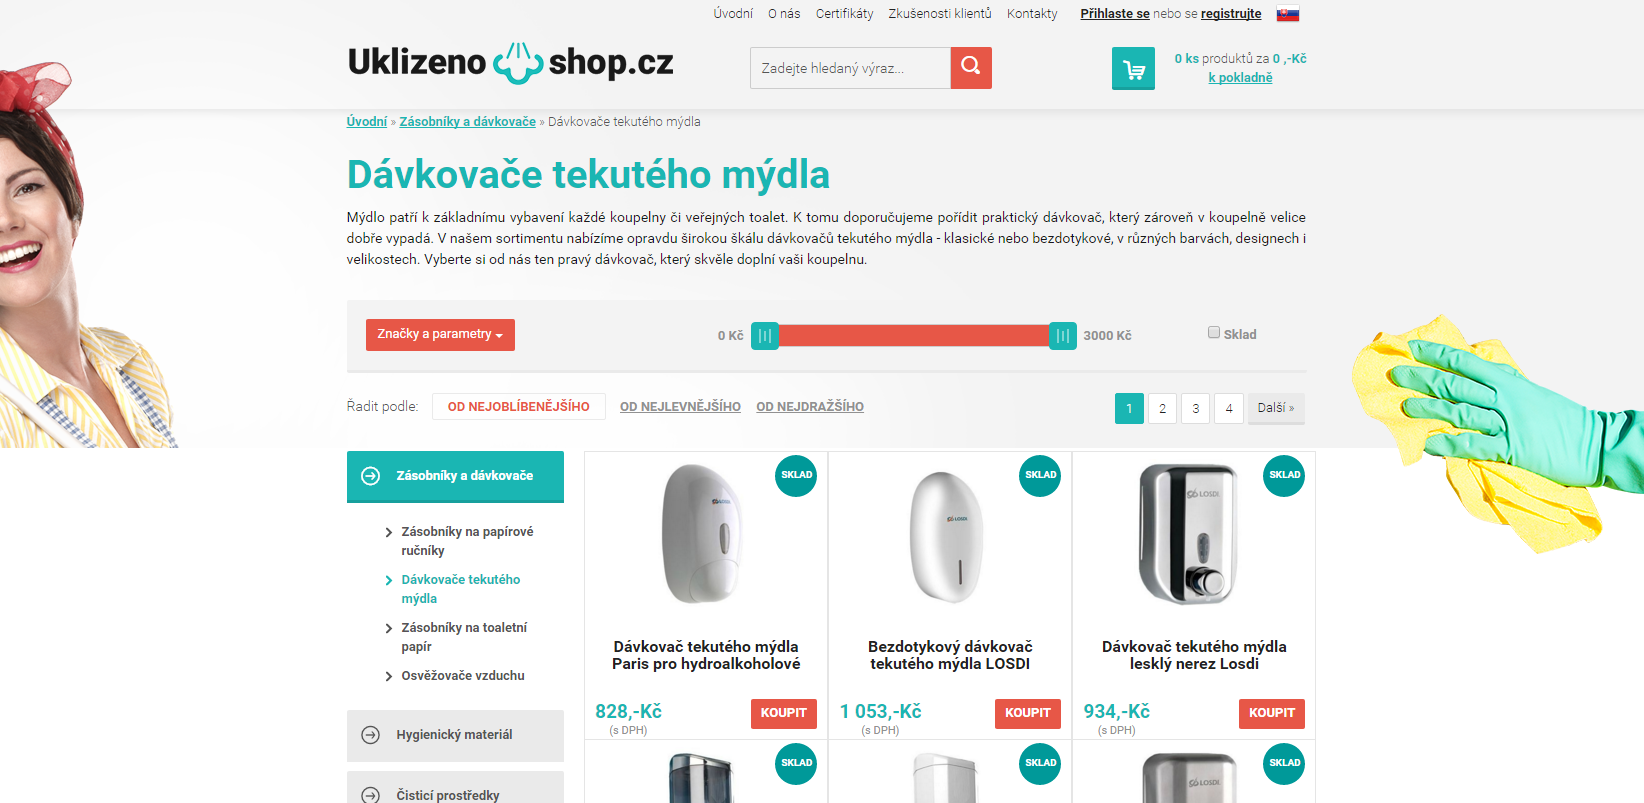 uklizenoshop.cz